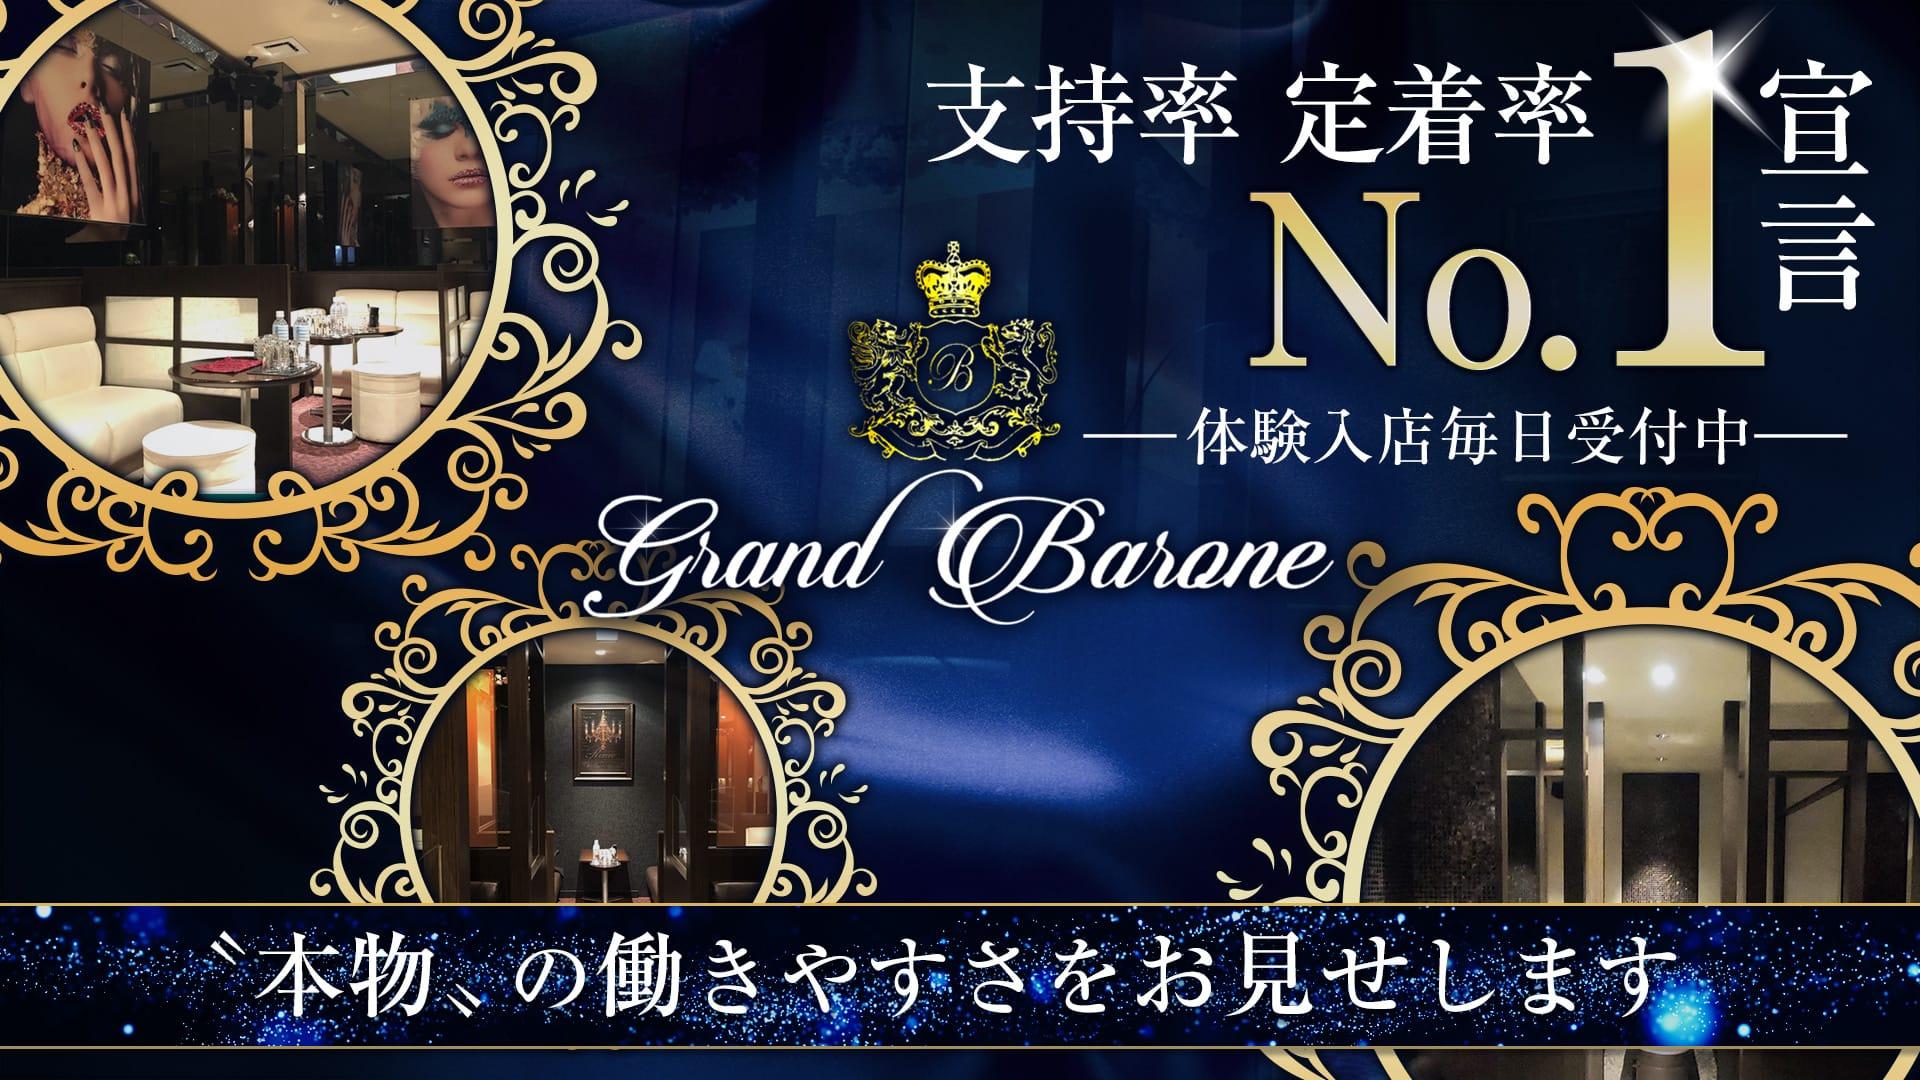 Grand Barone(グランバローネ)【公式求人・体入情報】 中洲ニュークラブ TOP画像